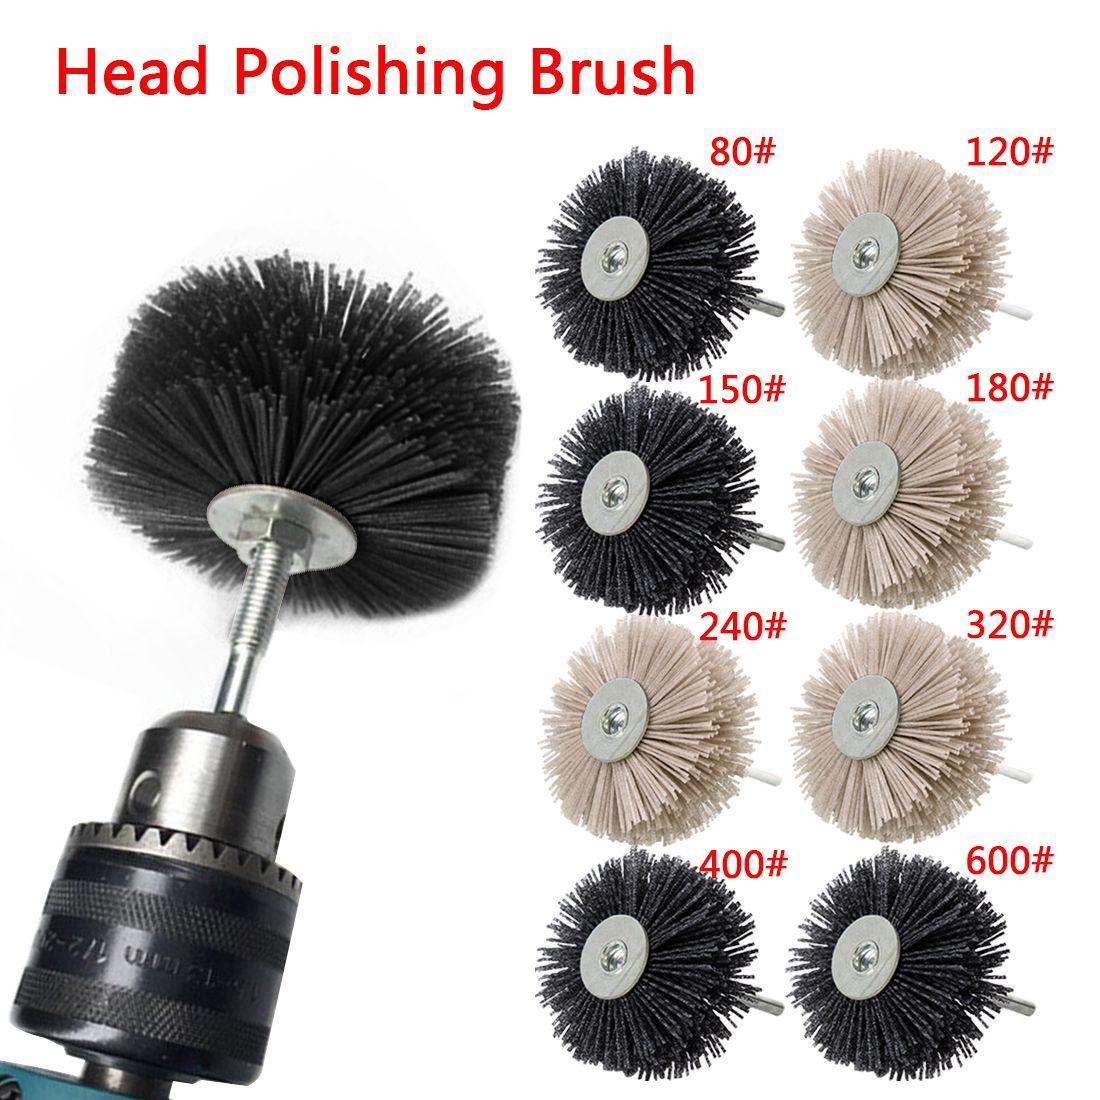 Nylon Wheel Brush 1pc Abrasive Wire Grinding Flower Head Abrasive Woodwork Polishing Brush Bench Grinder For Wood Furniture